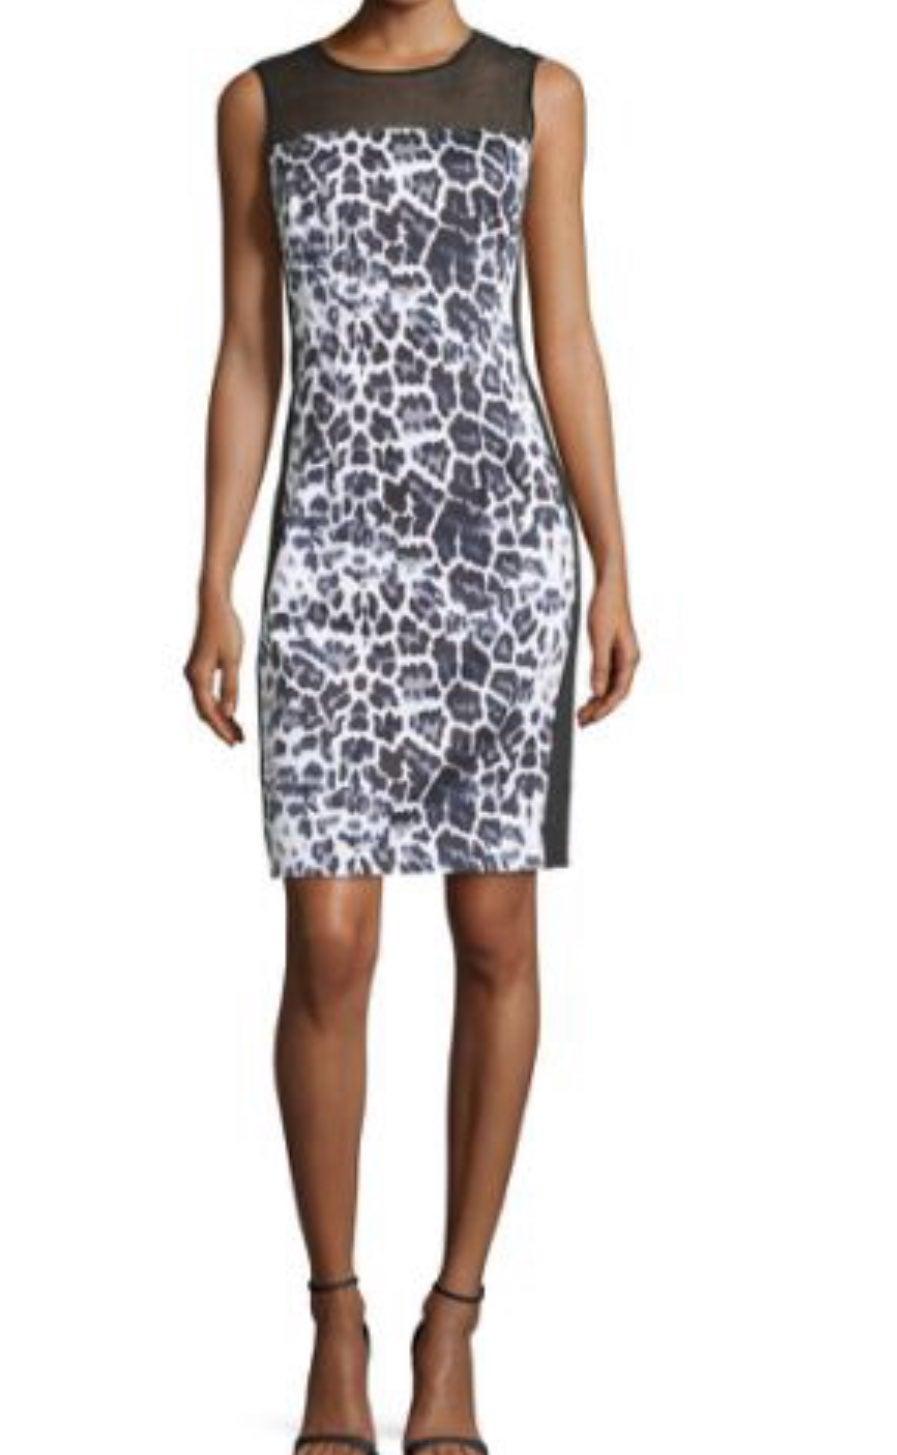 Tahari Bodycon Leopard Mesh Dress-4